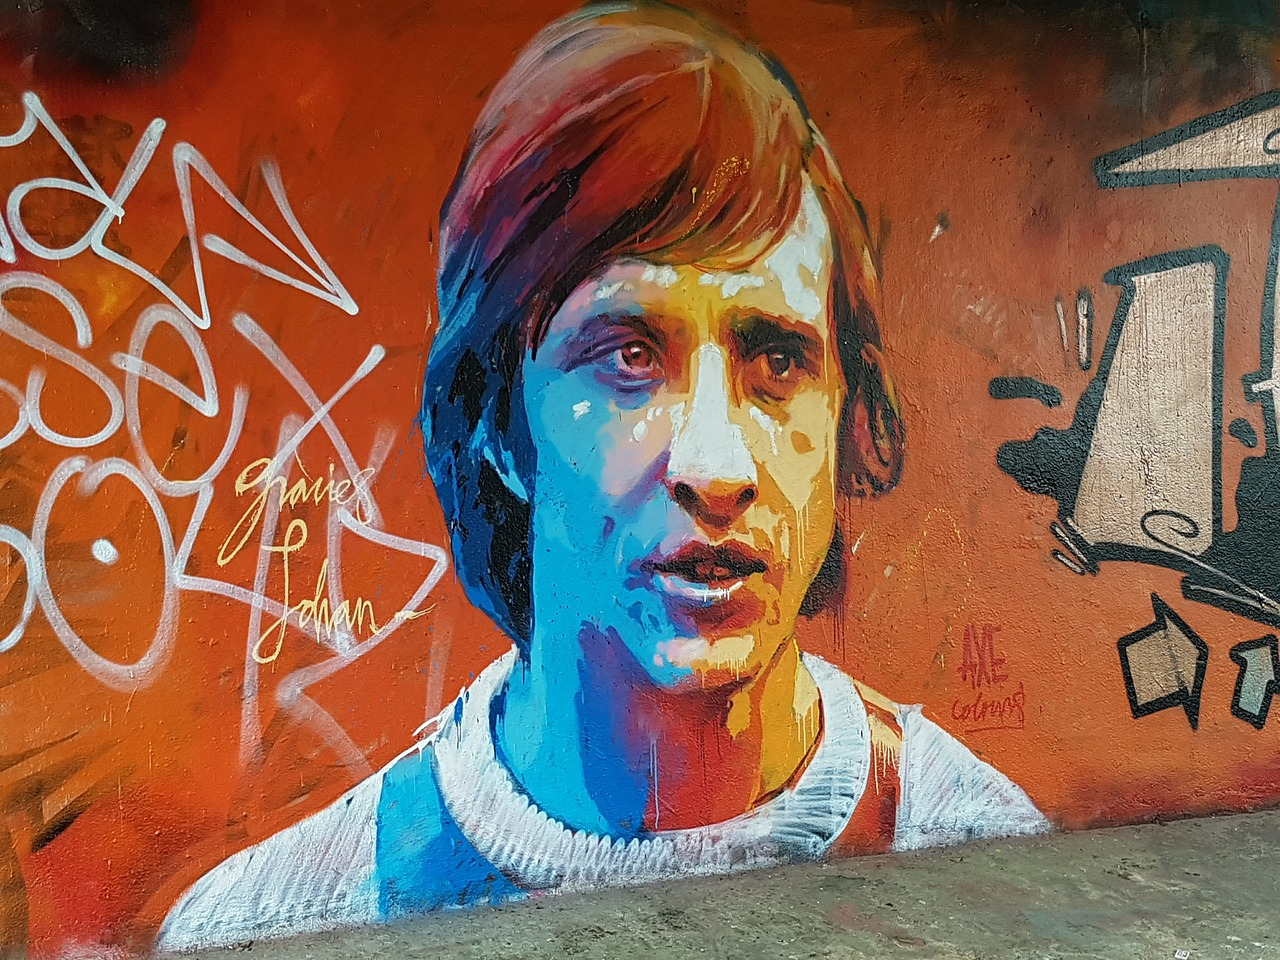 Johan Cruyff - alignthoughts